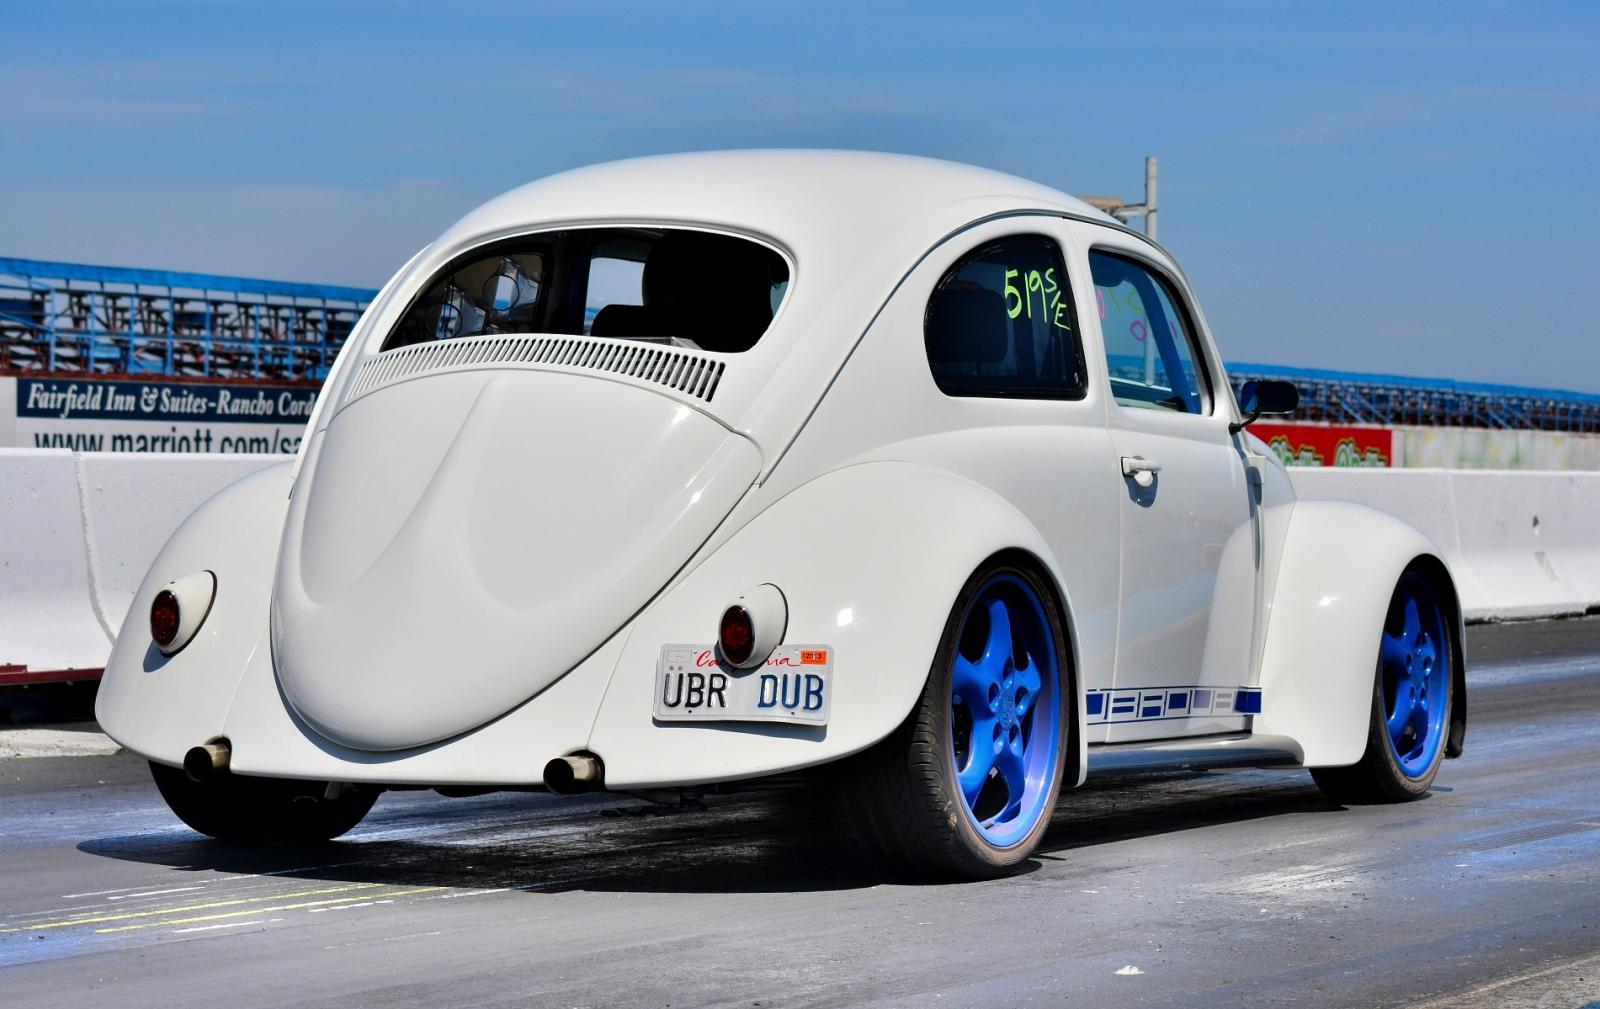 1960 Beetle With A Turbo Audi I4 Engine Swap Depot